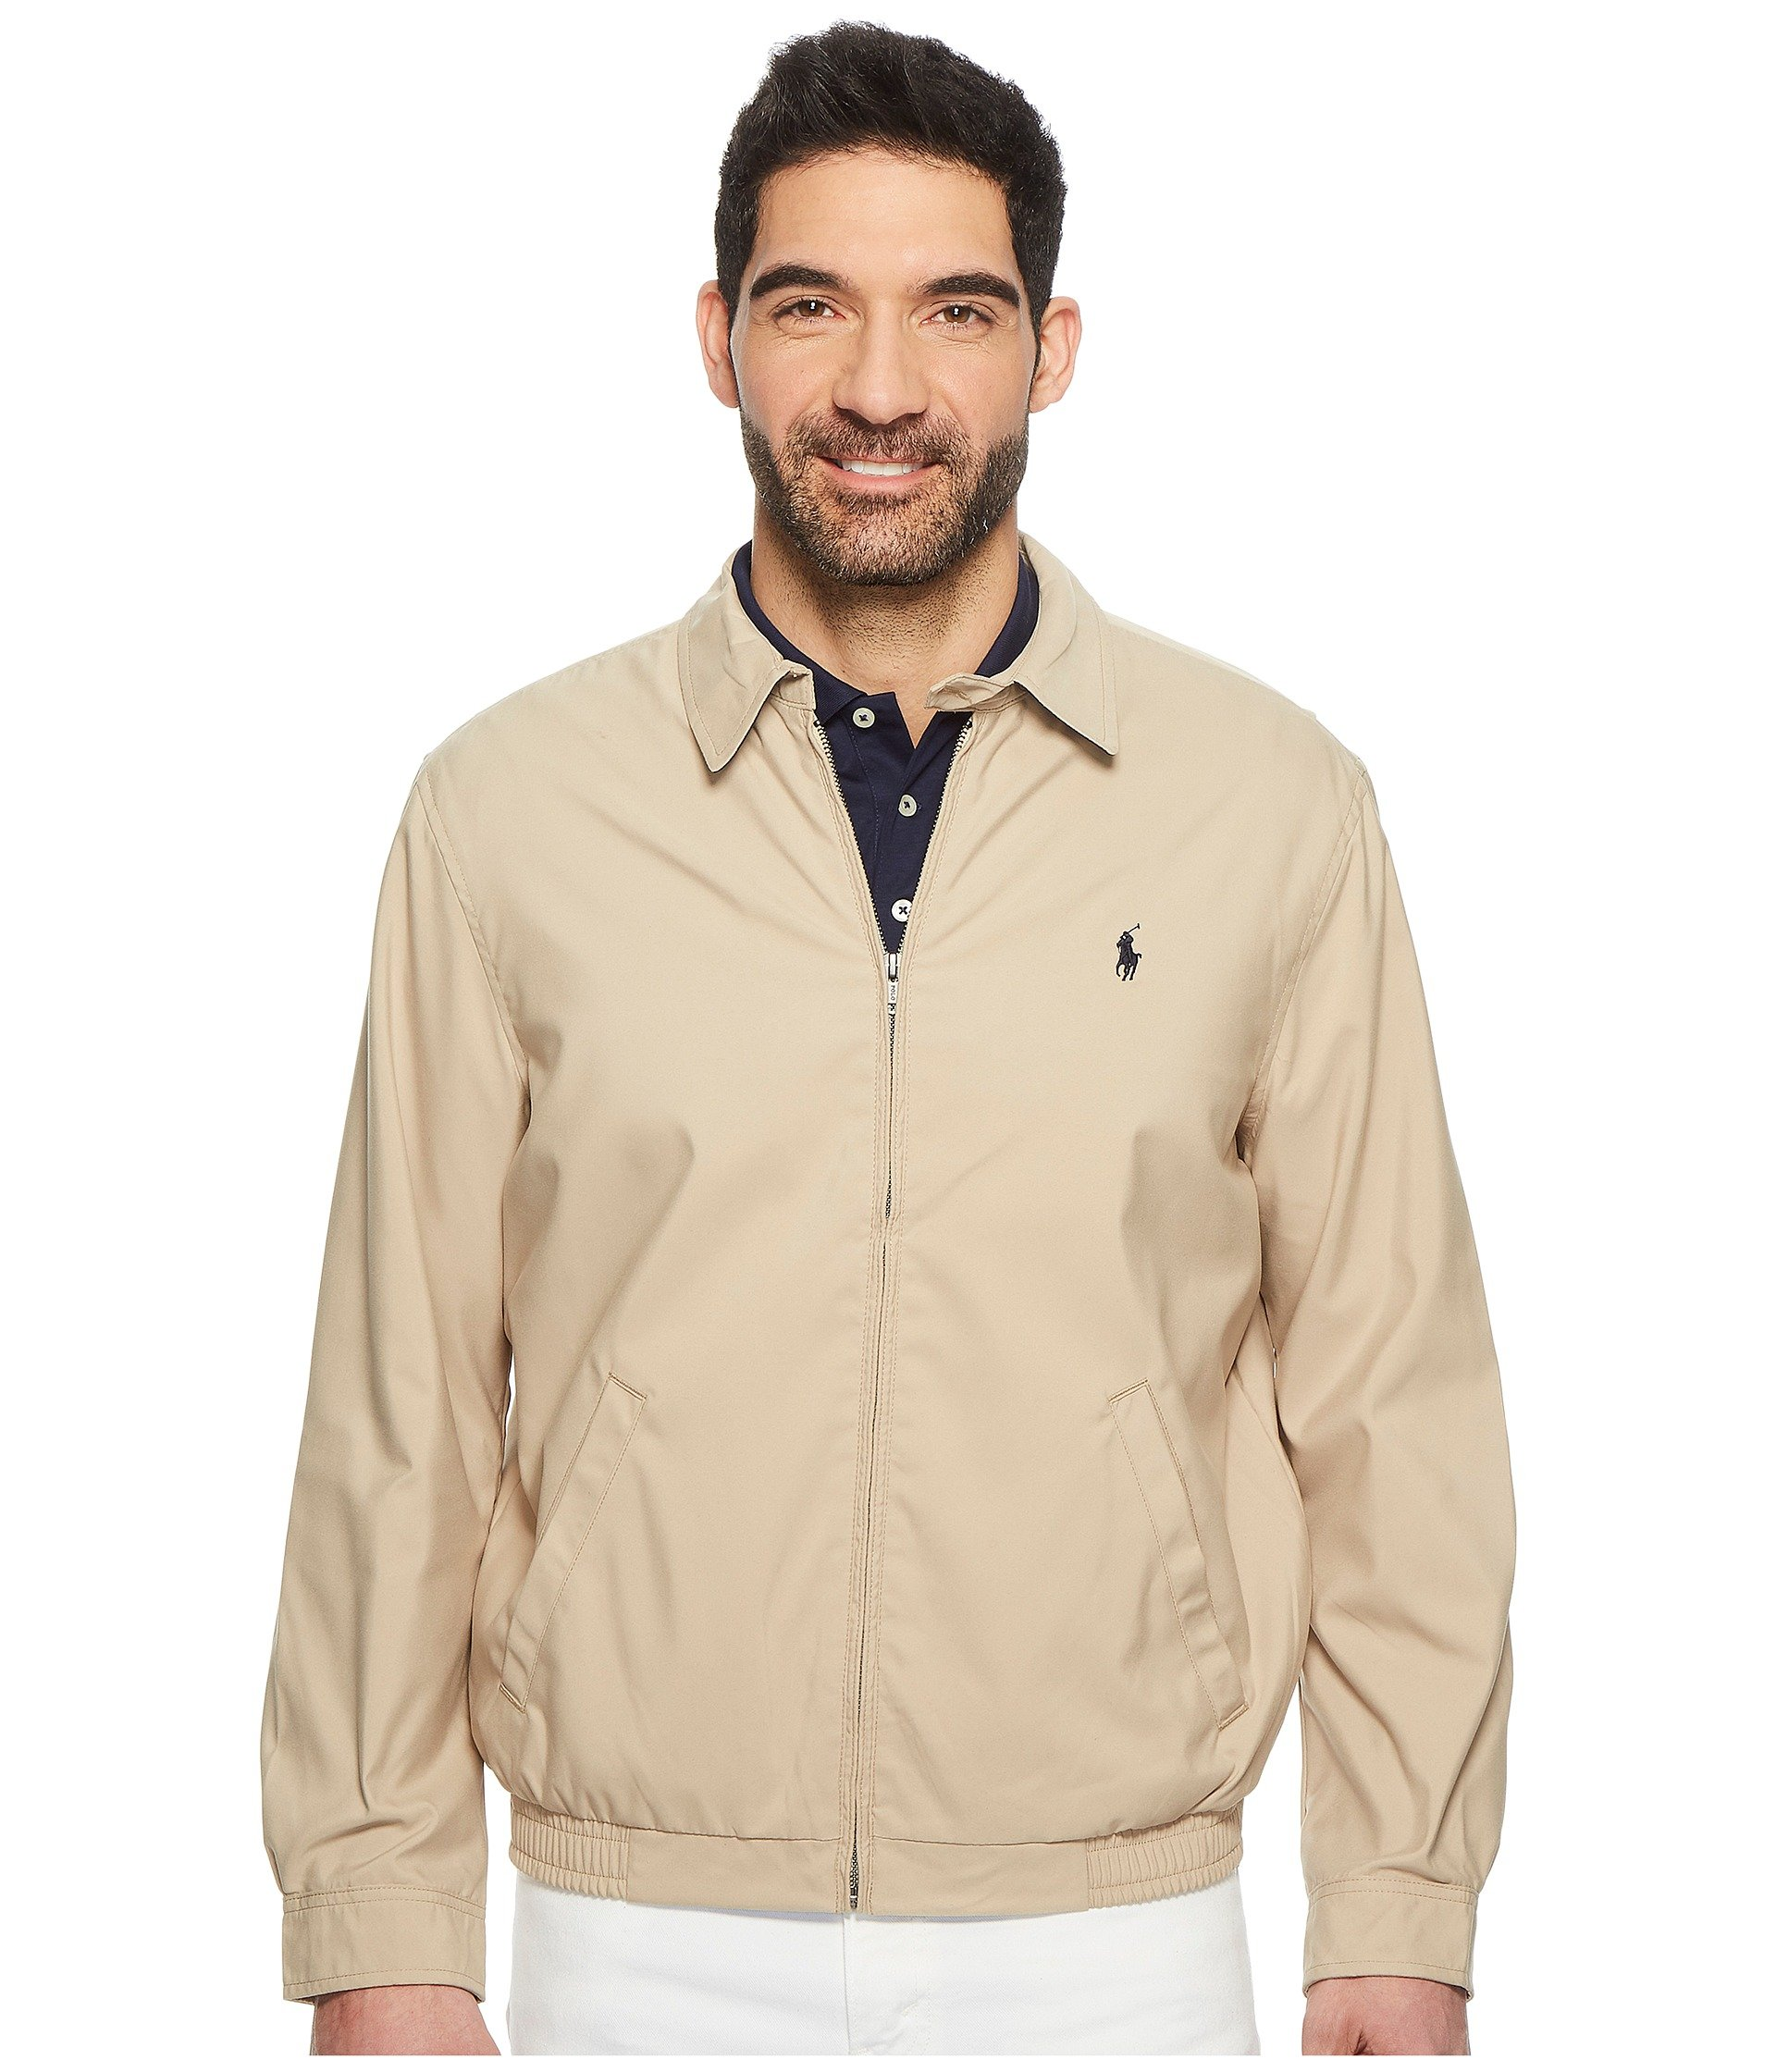 06401922238aae Galleon - Polo Ralph Lauren Mens Bi-Swing Windbreaker Jacket (Khaki,  XX-Large)